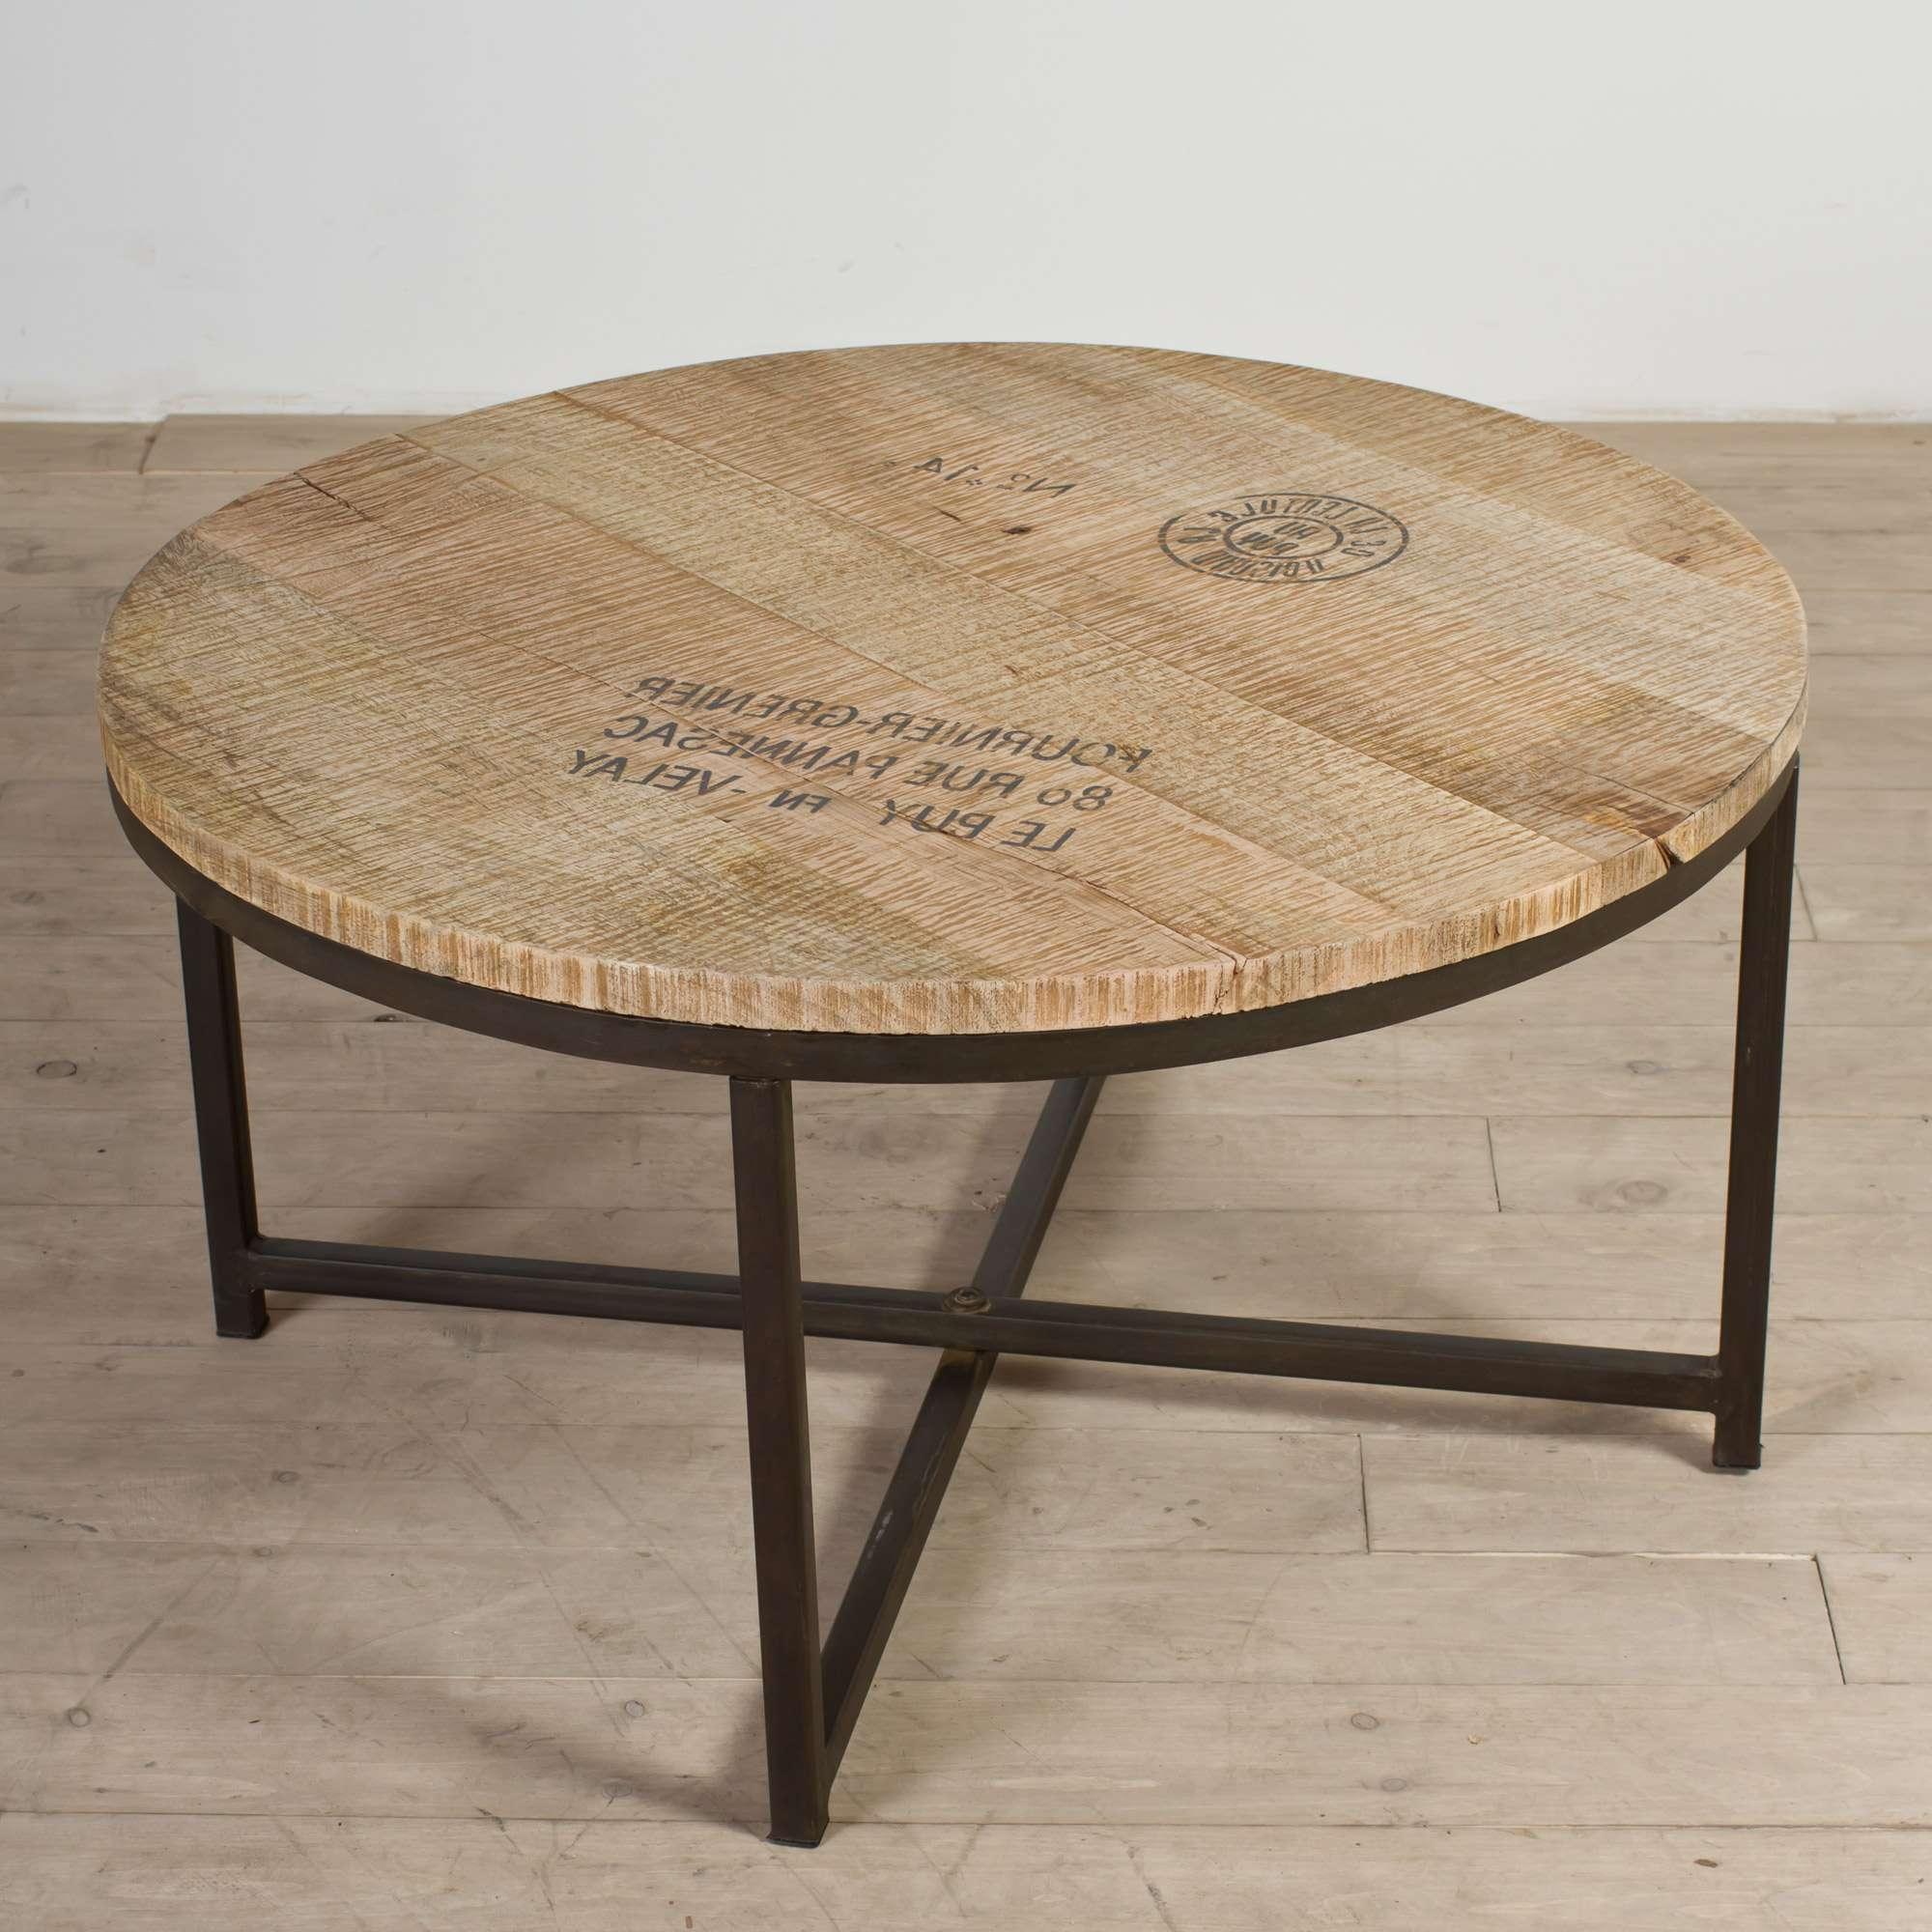 Coffee Table : Wonderful Round Metal Coffee Table Rustic Round With Regard To 2017 Metal Round Coffee Tables (View 6 of 20)